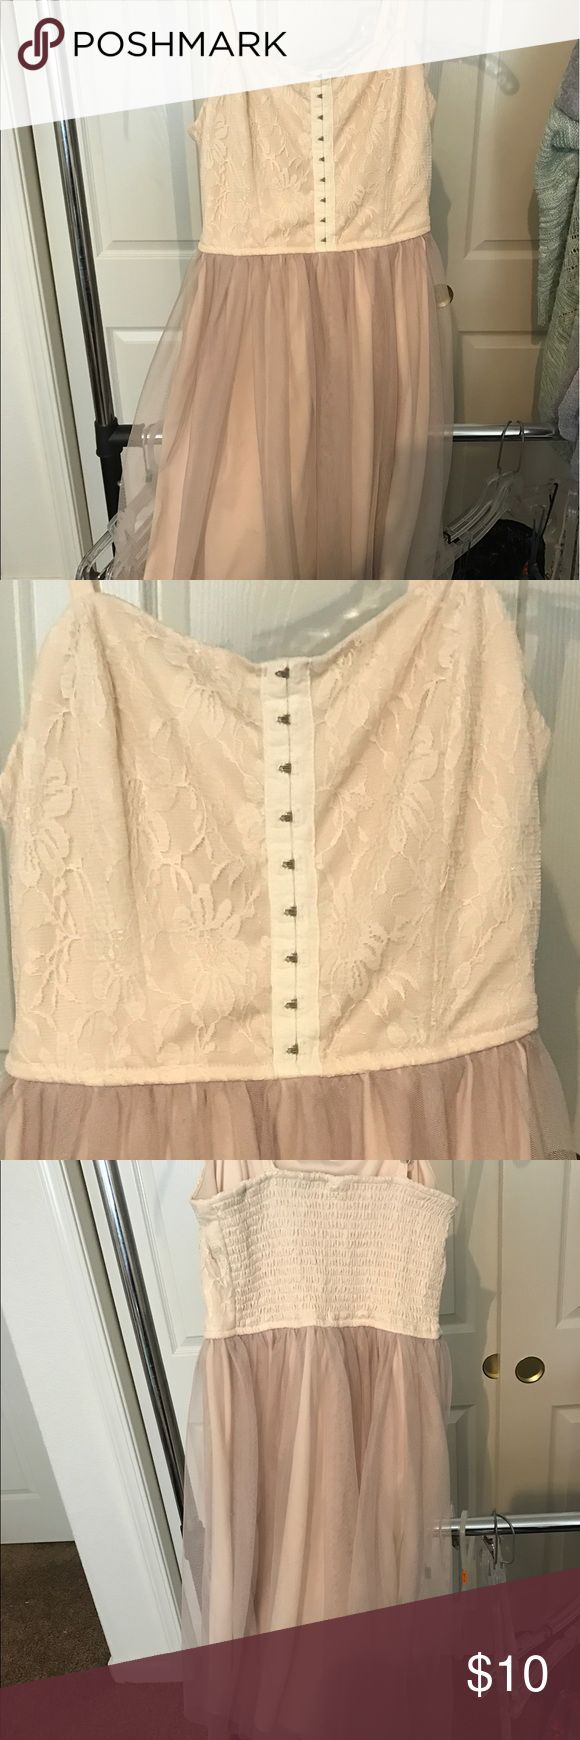 Cream color dress Very cute good condition Xhilaration Dresses Mini